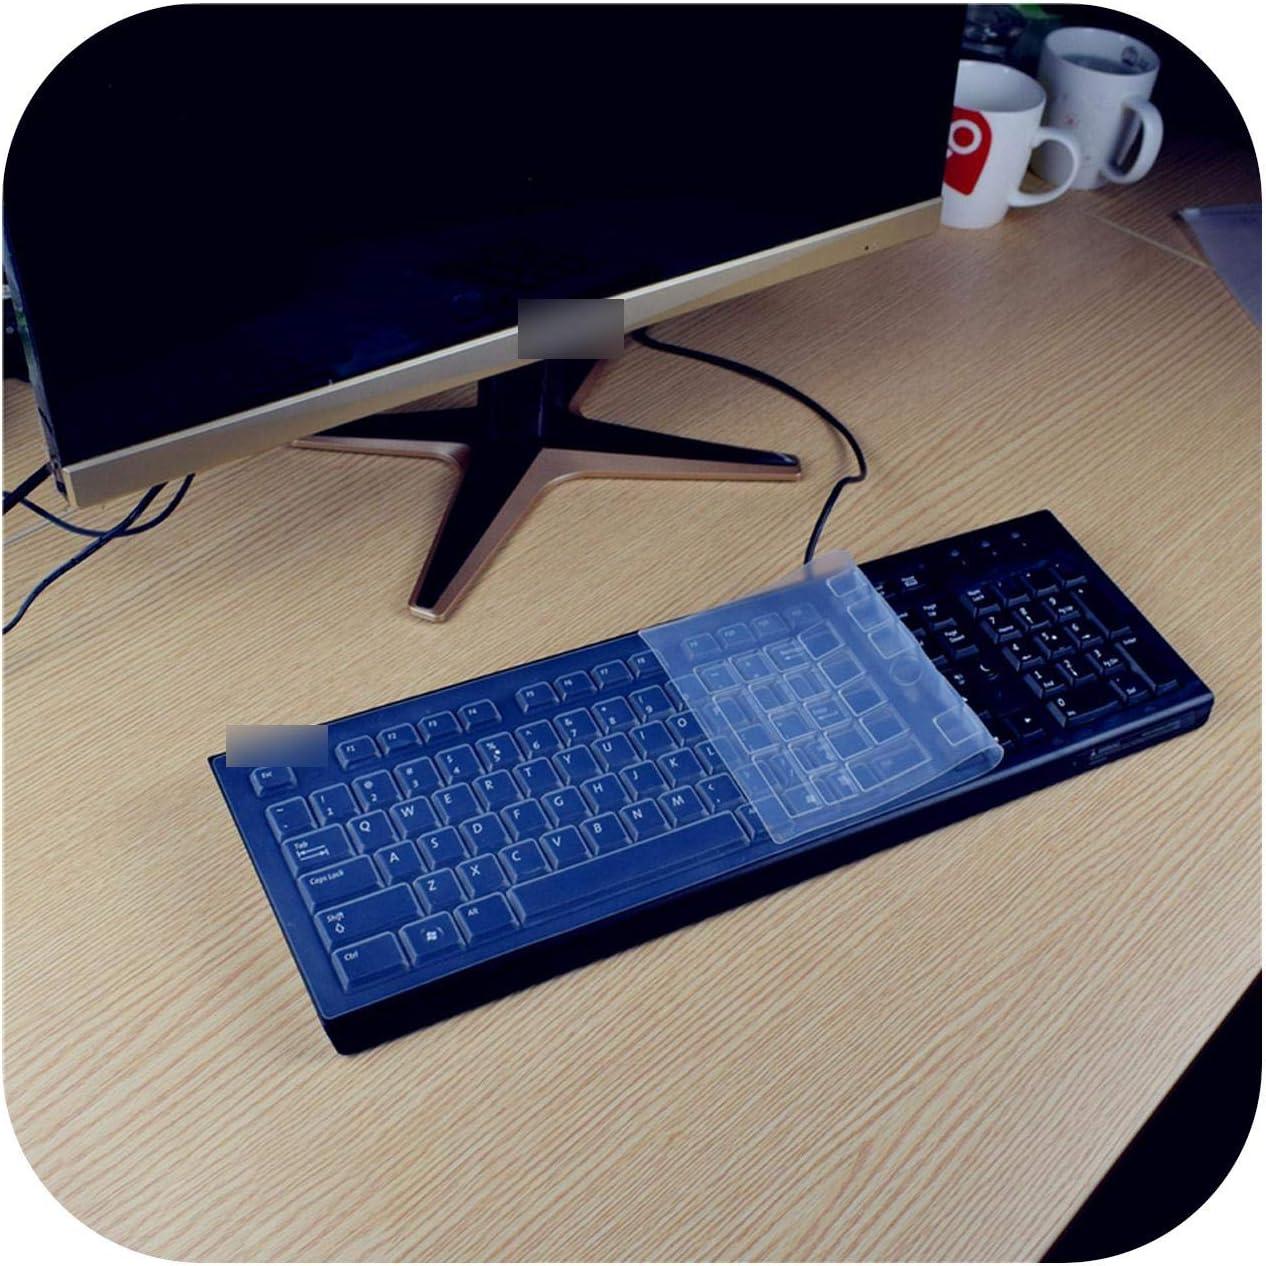 for Hp Compaq Acer Pr1101U Desktop Pc Keyboard Covers Waterproof Dustproof Clear Keyboard Cover Protector Skin-Pink